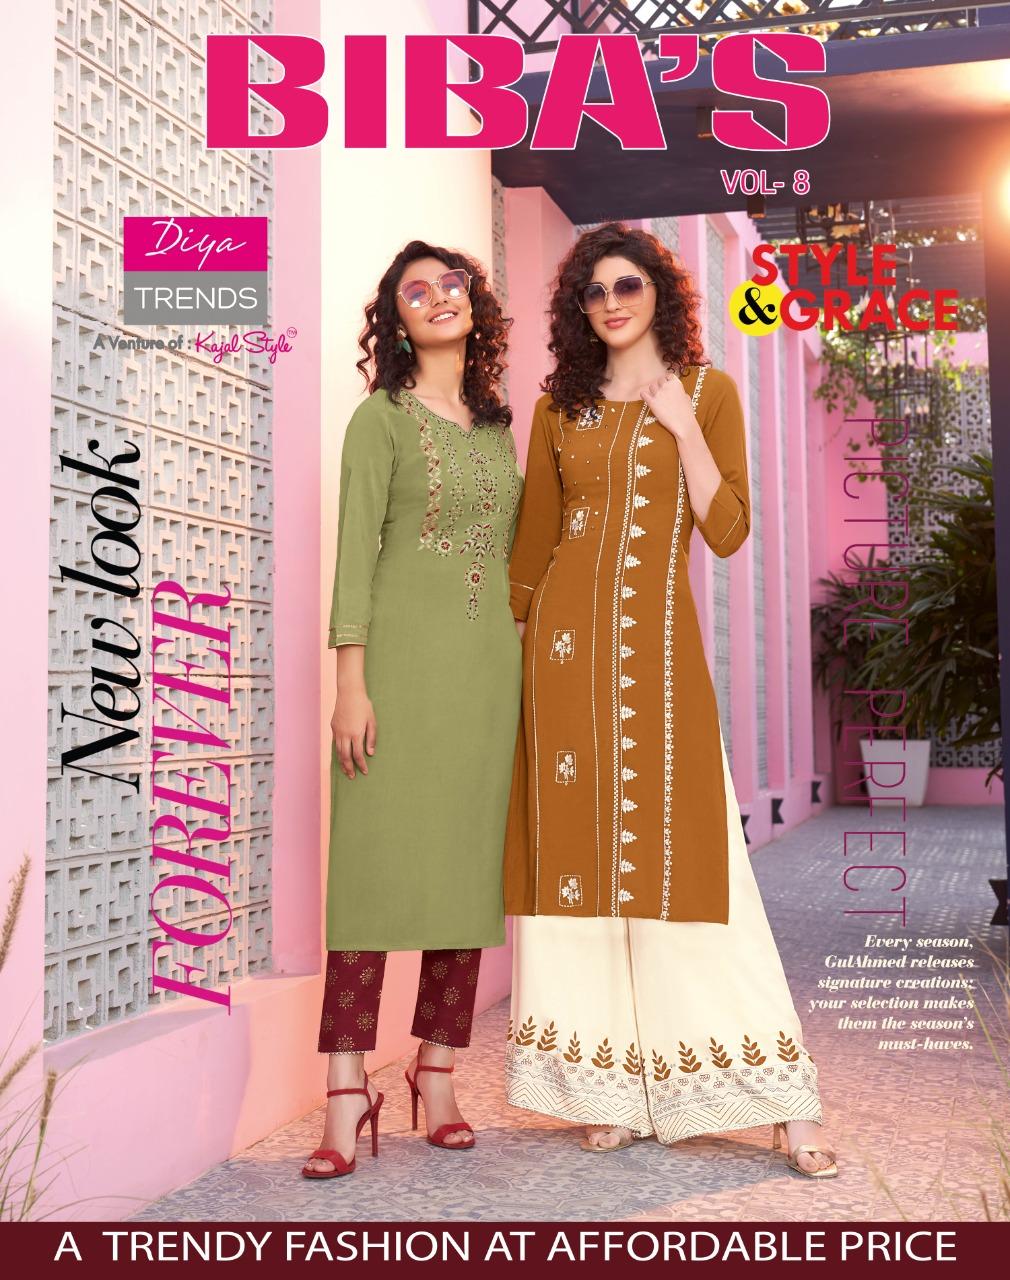 Diya Trends Bibas Vol 8 by Kajal Style Kurti with Palazzo Pant Wholesale Catalog 14 Pcs 7 - Diya Trends Biba's Vol 8 by Kajal Style Kurti with Palazzo Pant Wholesale Catalog 14 Pcs